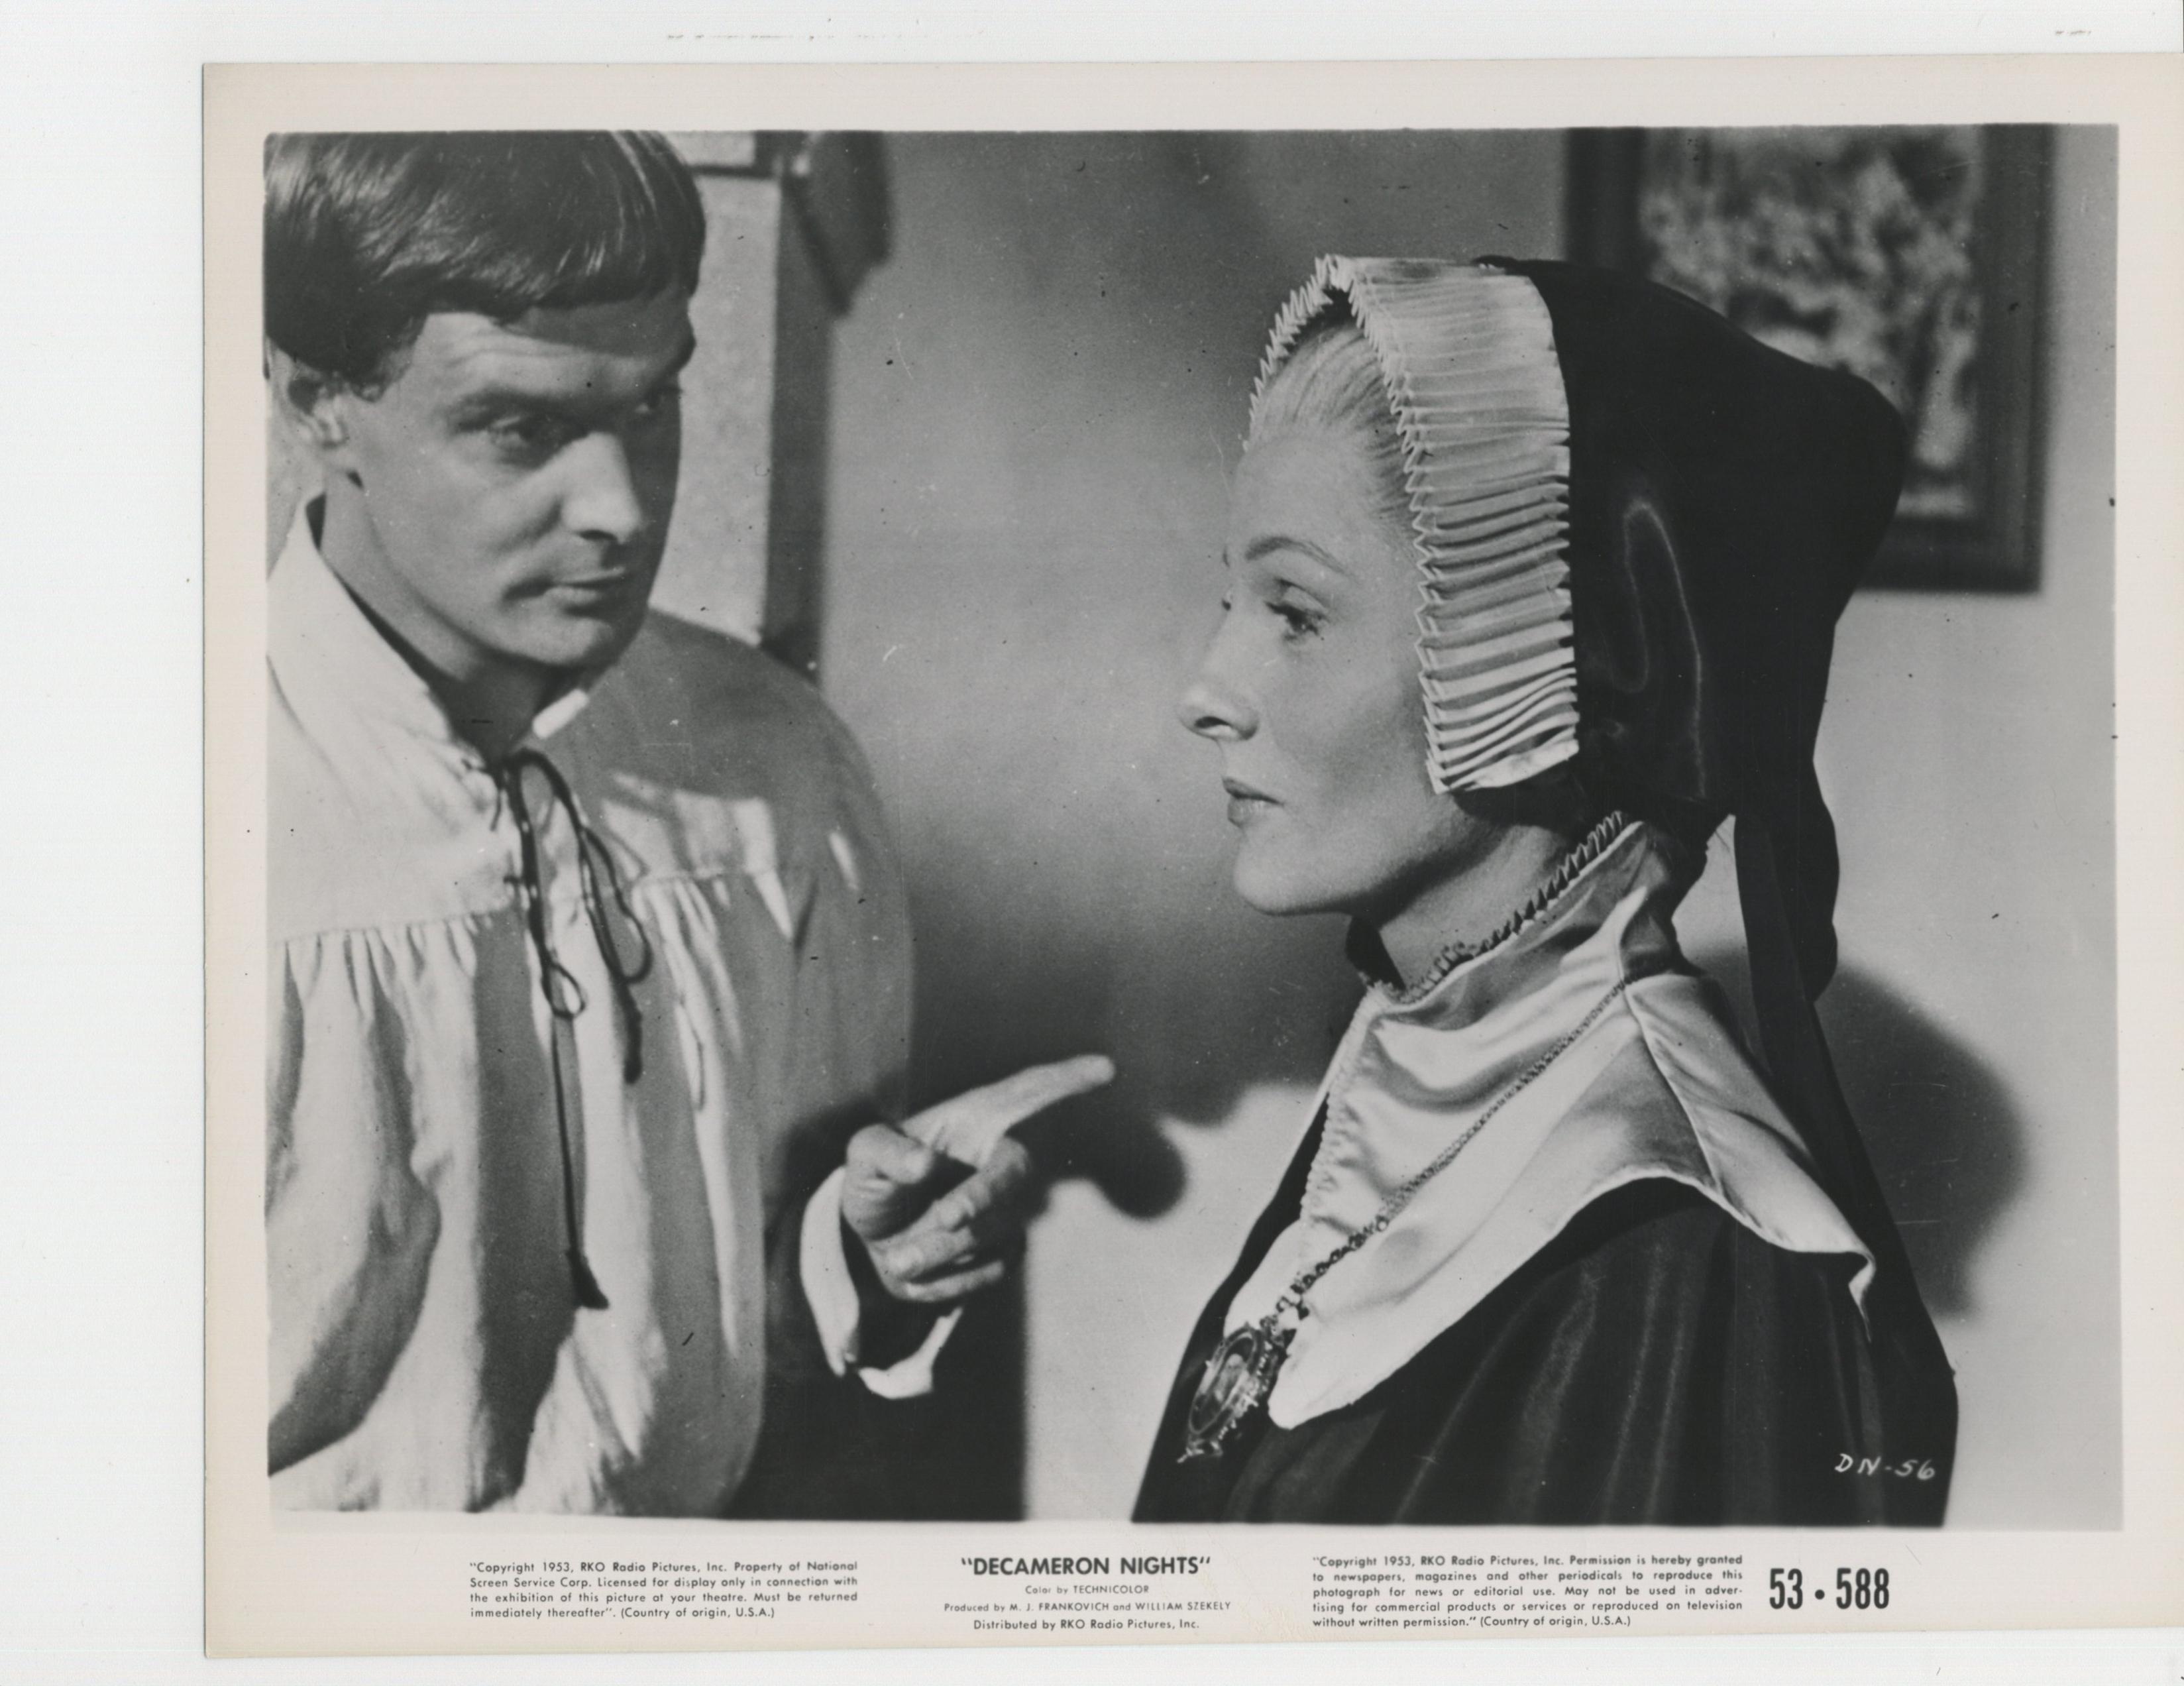 Joan Fontaine and Louis Jourdan in Decameron Nights (1953)